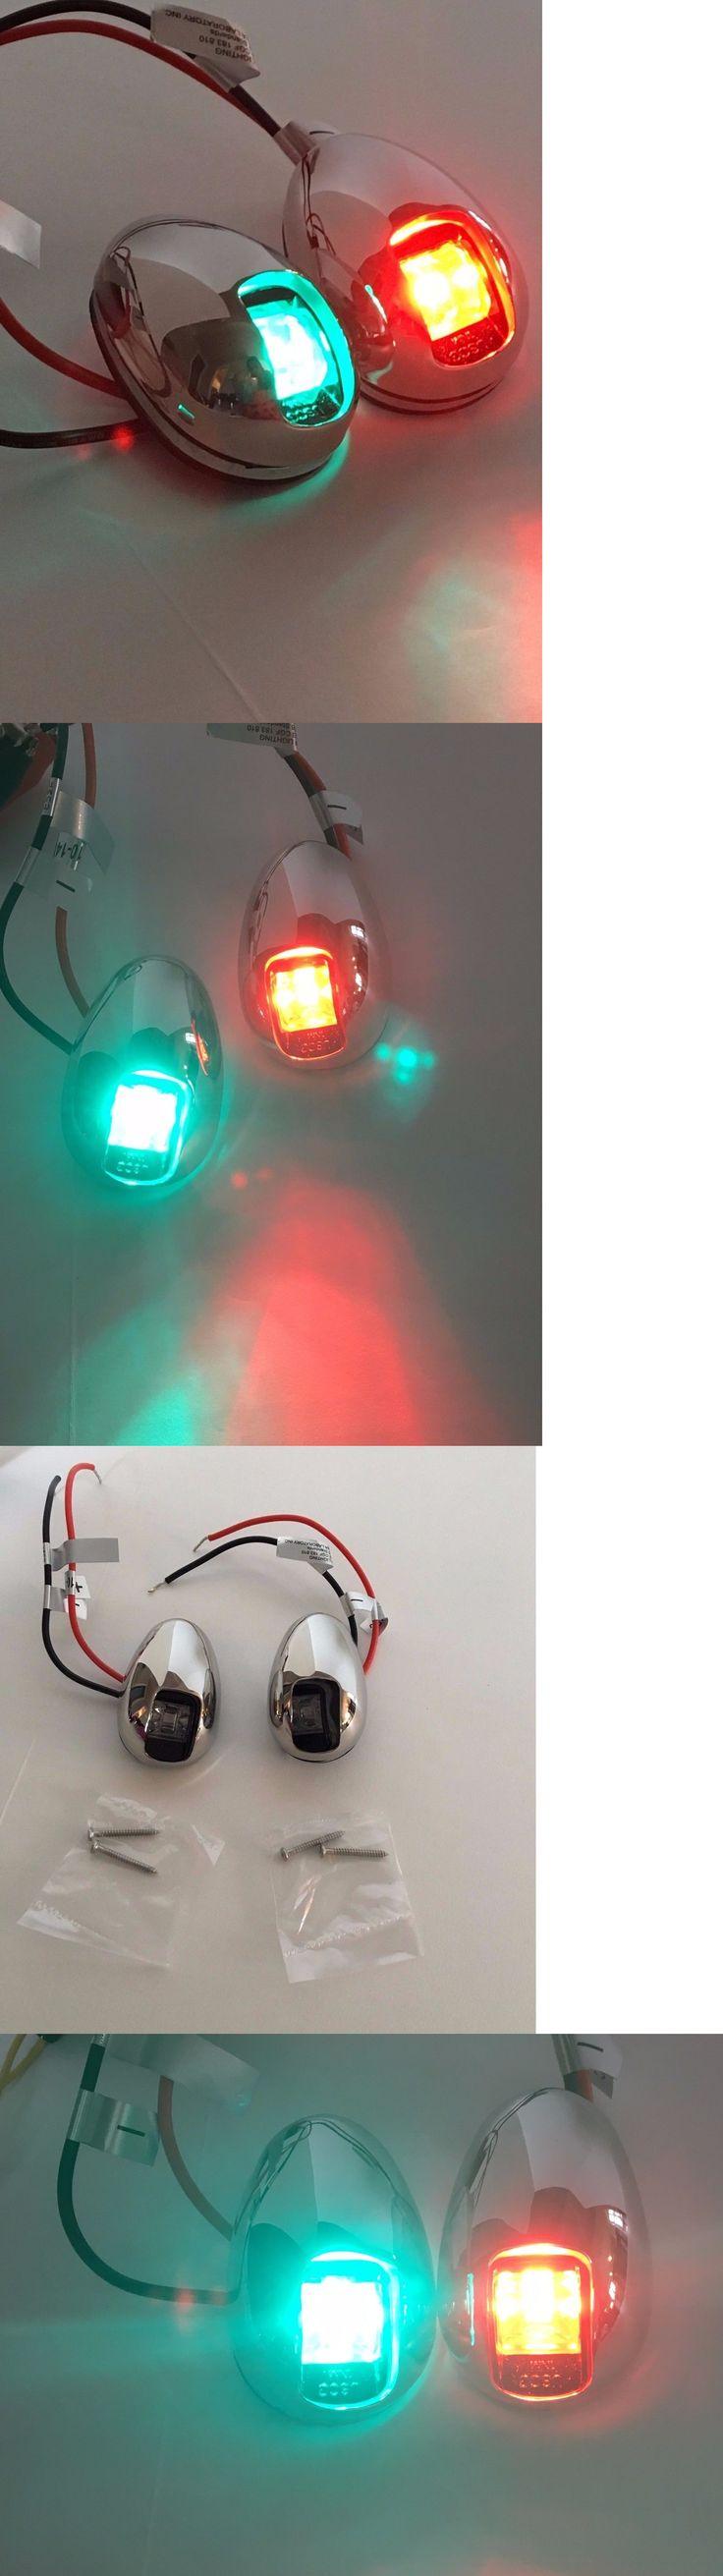 boat parts: 1 Pair Red And Green Boat Vertical Mount 12V Led Navigation Lights Side Marker BUY IT NOW ONLY: $41.99